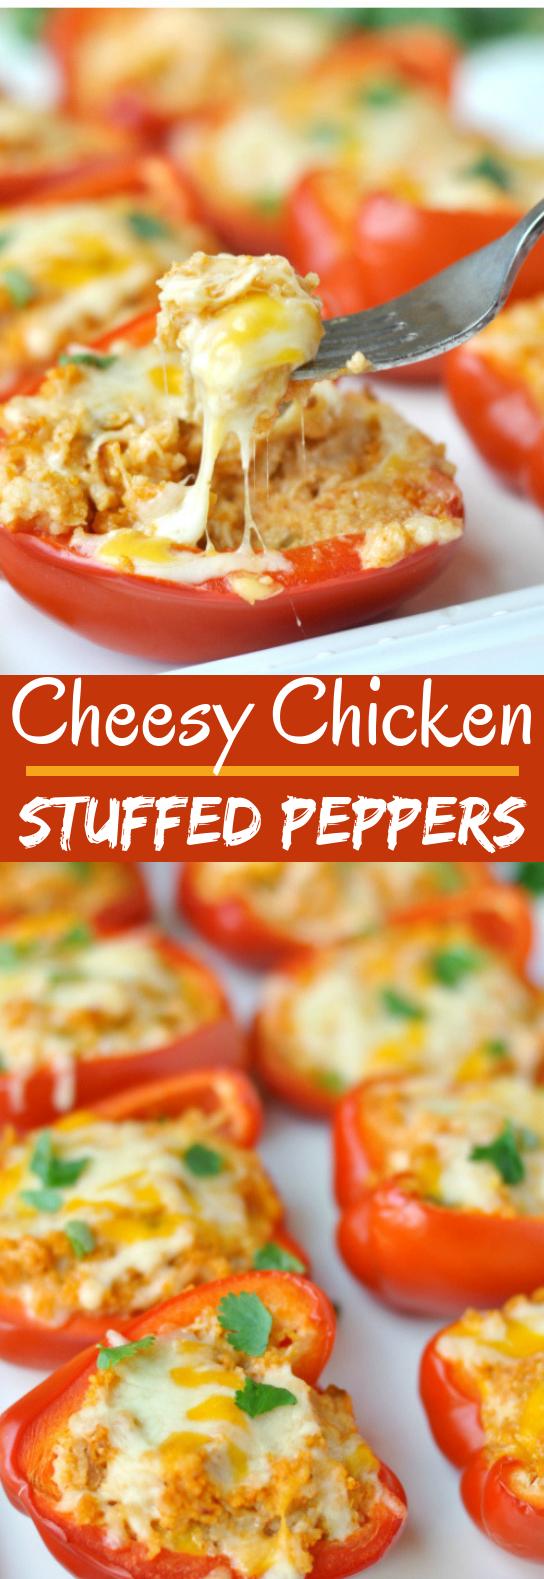 Cheesy Chicken Stuffed Peppers #keto #dinner